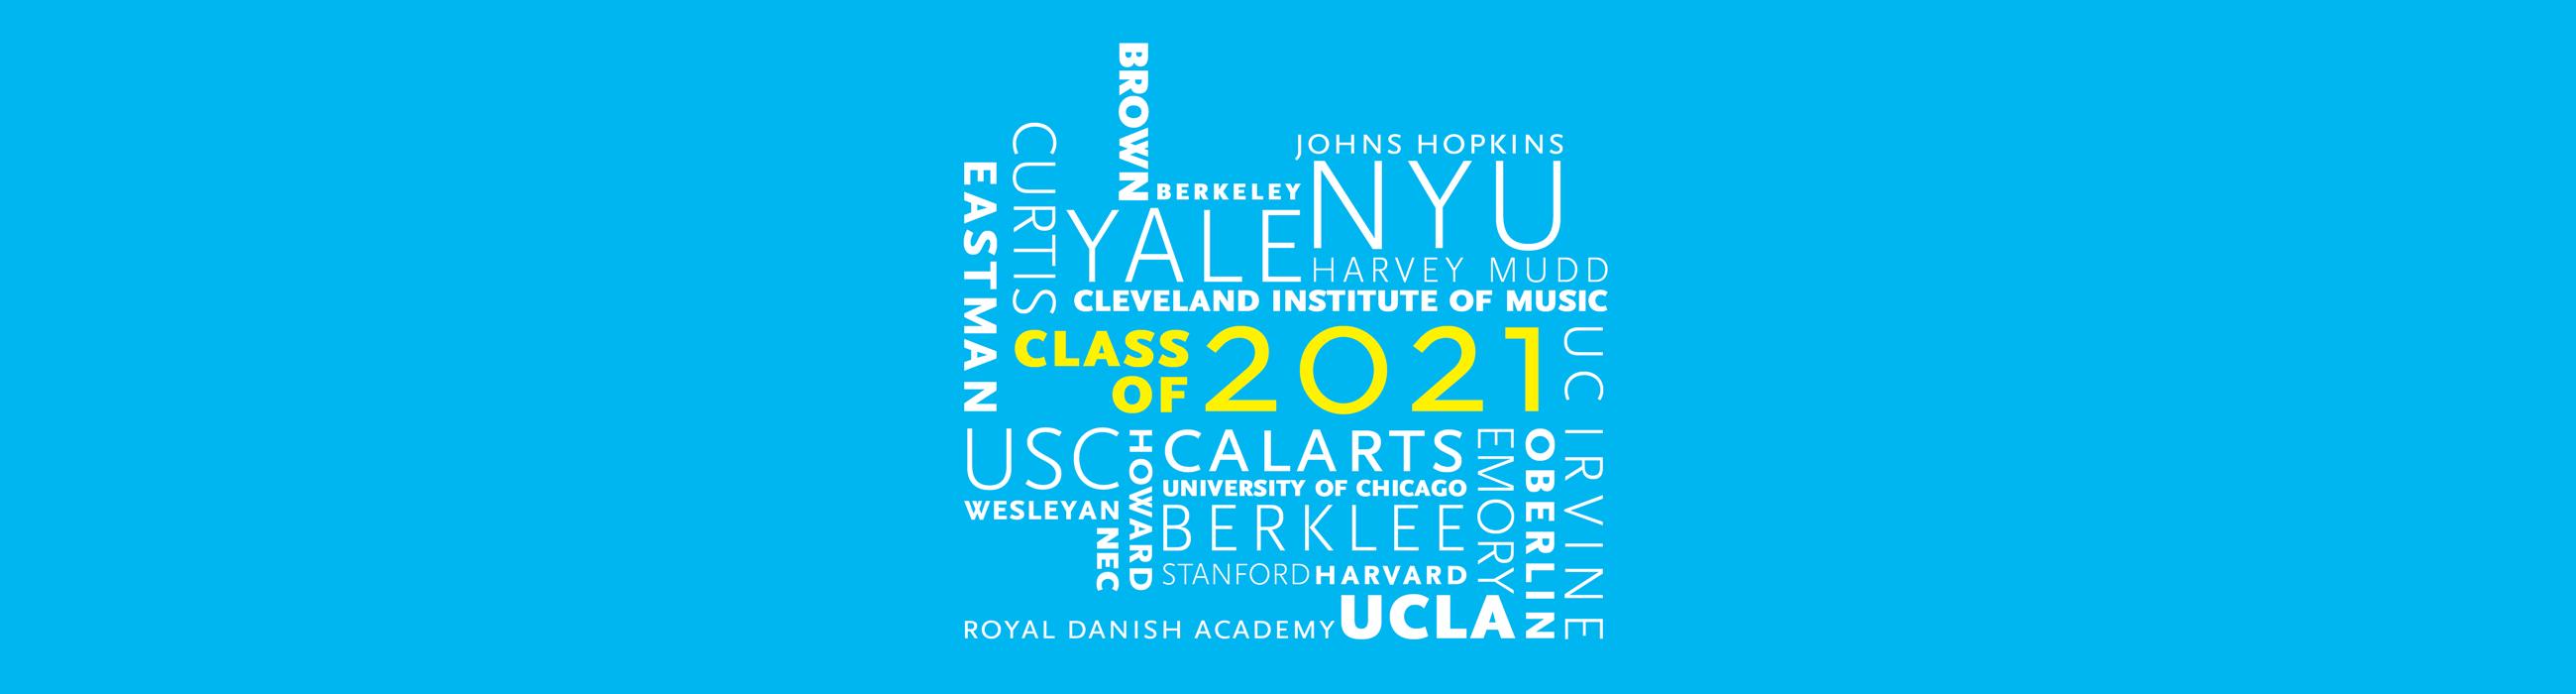 Word cloud of school names around Class of 2021